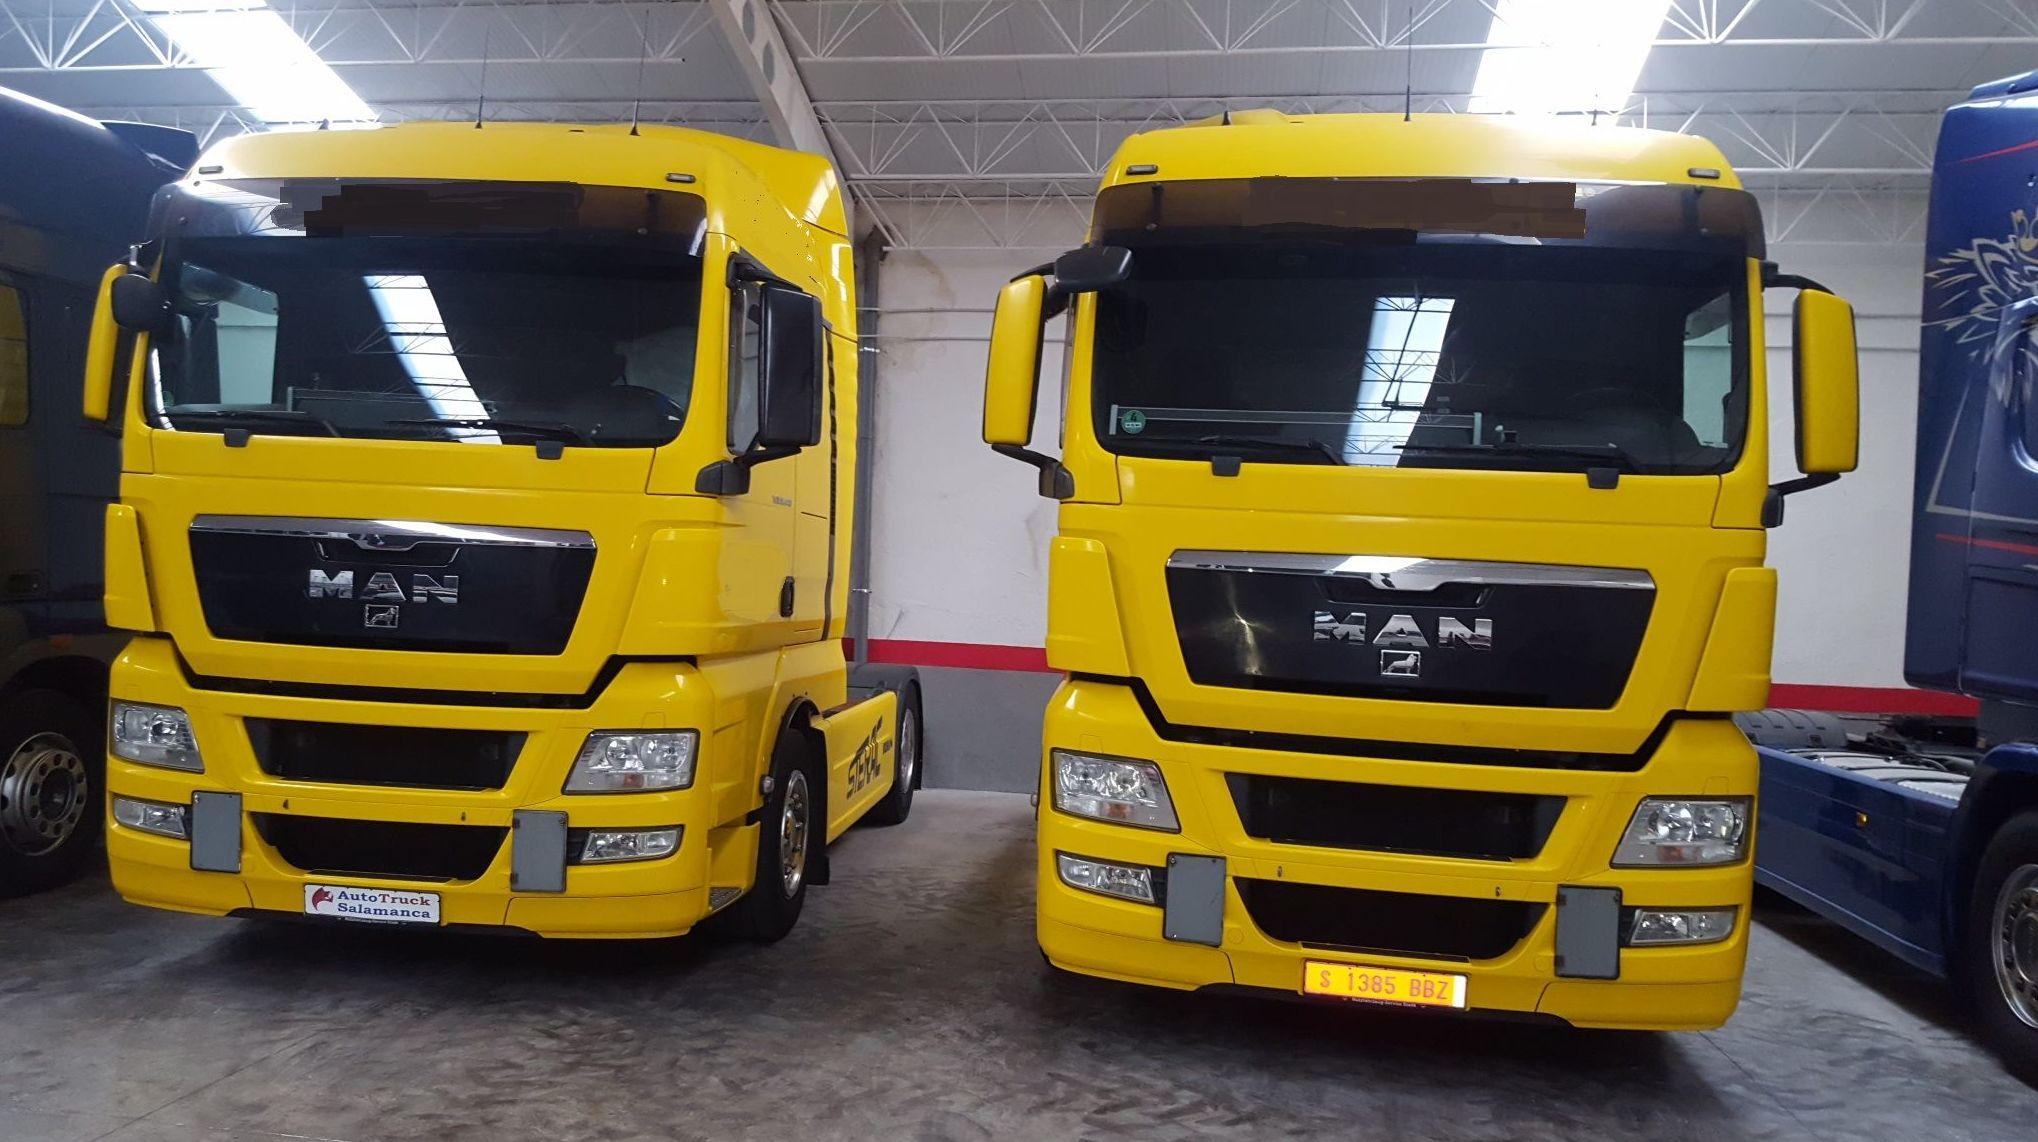 Foto 7 de Camiones en Villares de la Reina | Autotruck Salamanca